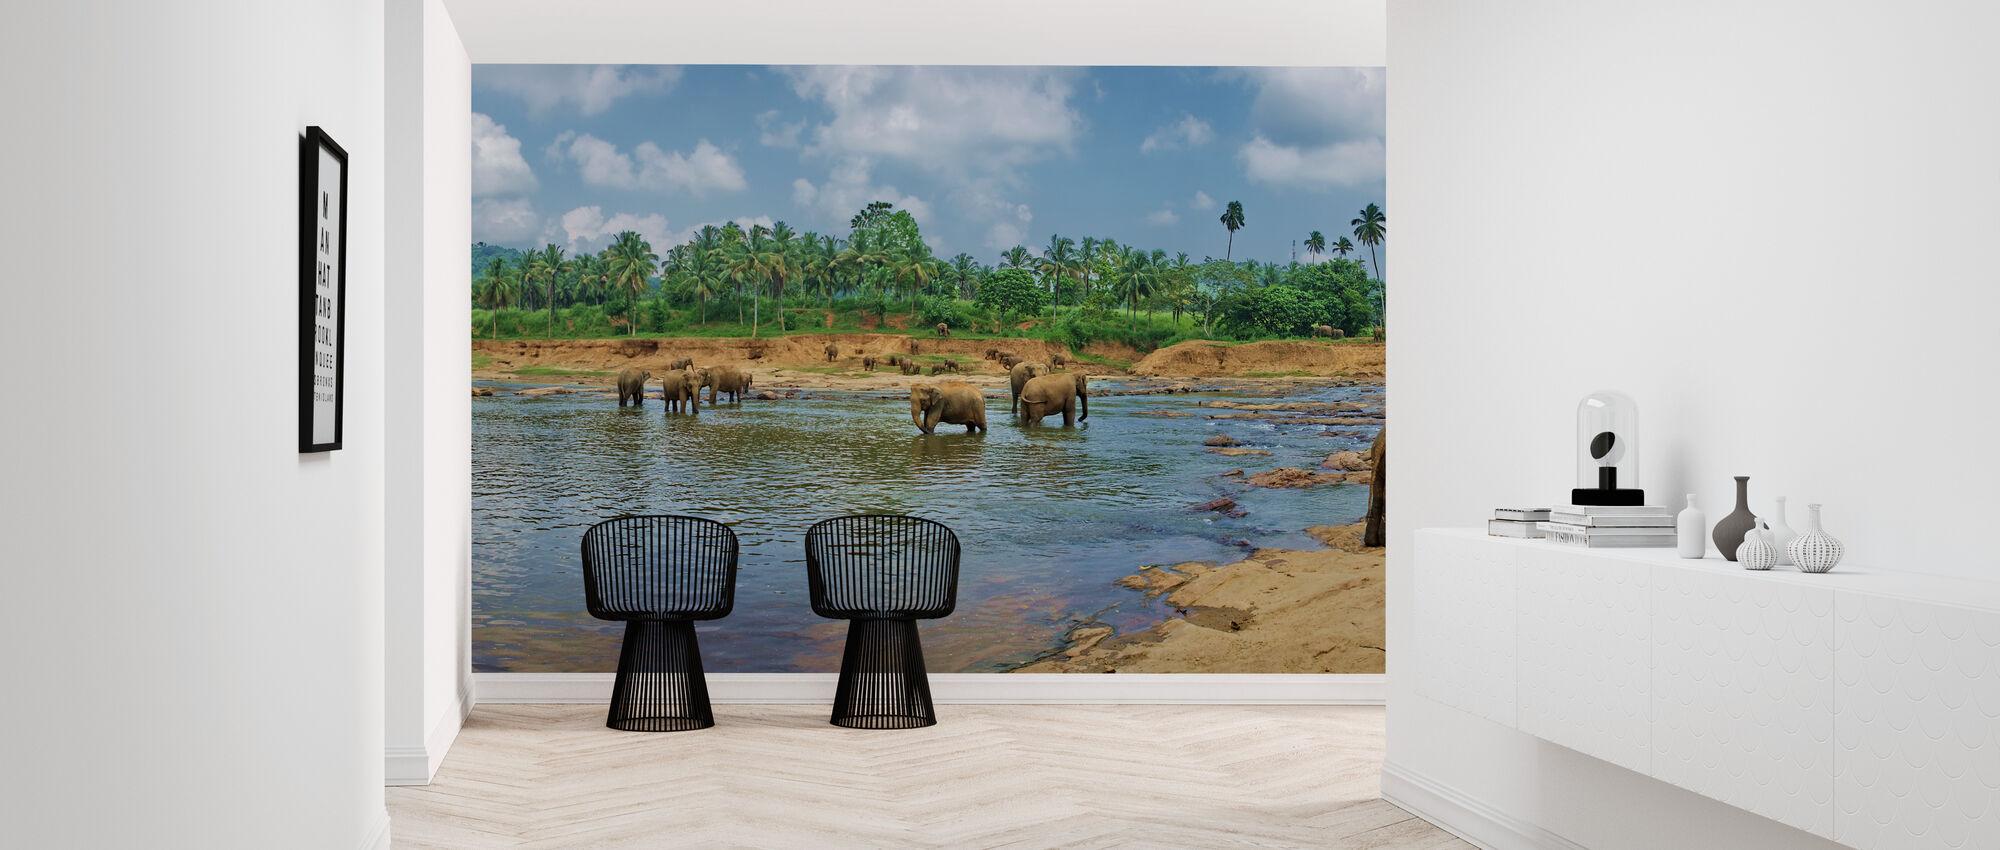 Park with Elephants - Wallpaper - Hallway